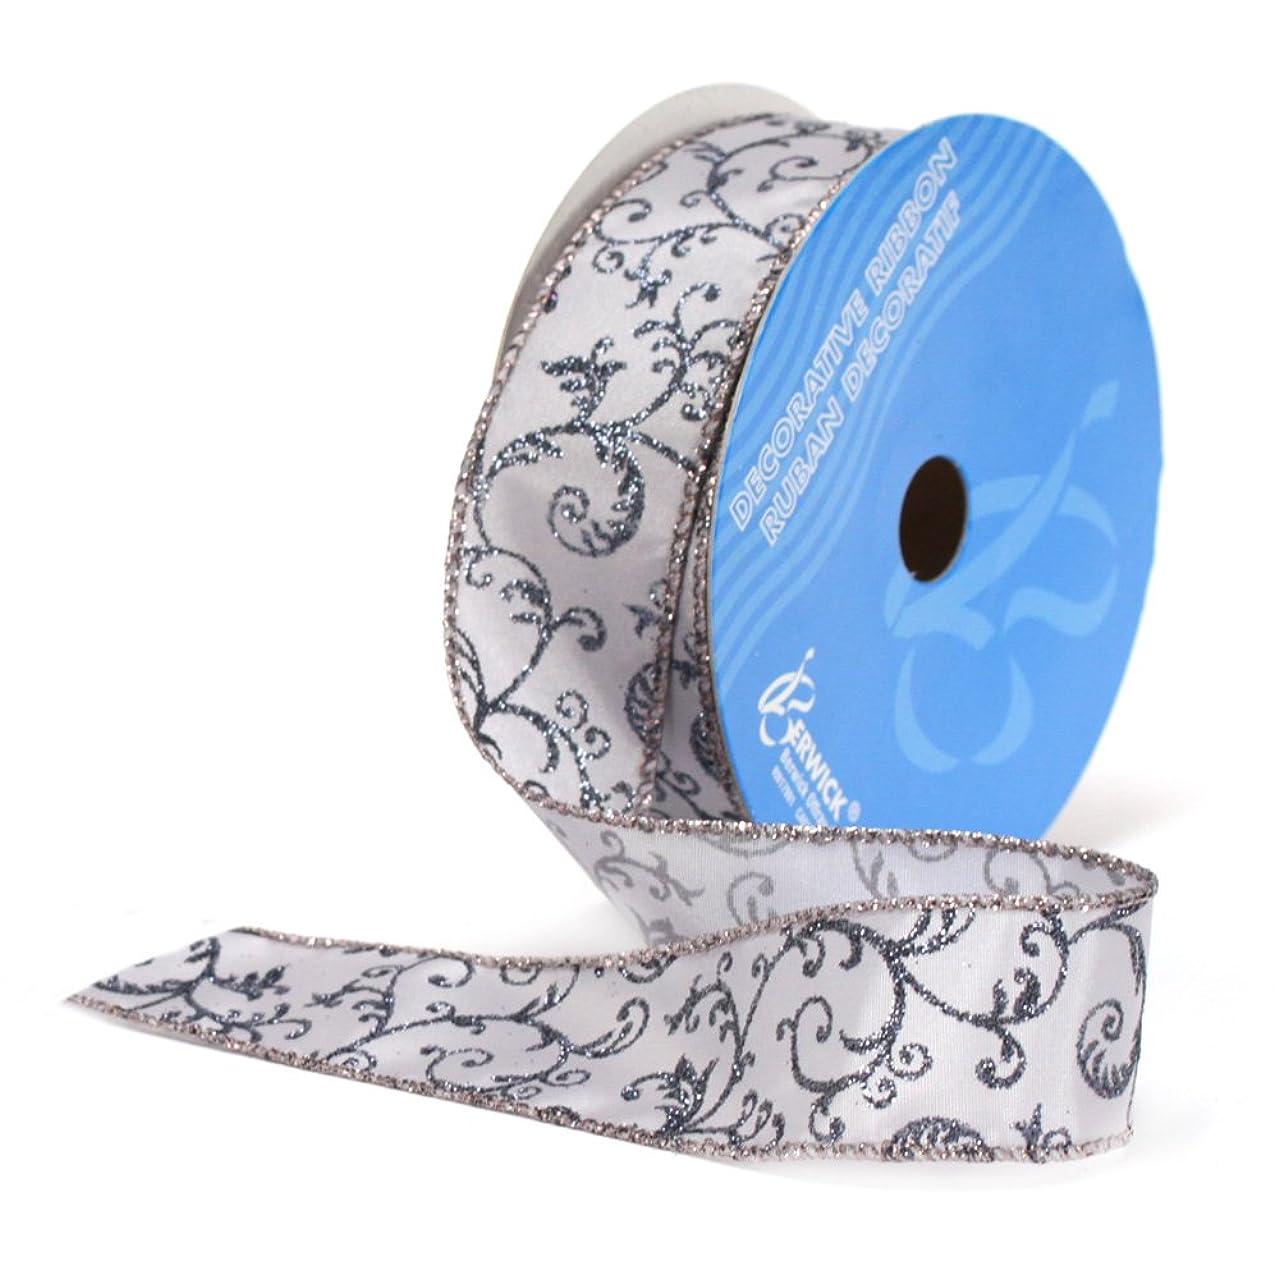 Berwick A13220-09025-B070 Monofilament Edge Parisian Craft Ribbon, 1-1/2-Inch Wide by 25-Yard Spool, Pewter